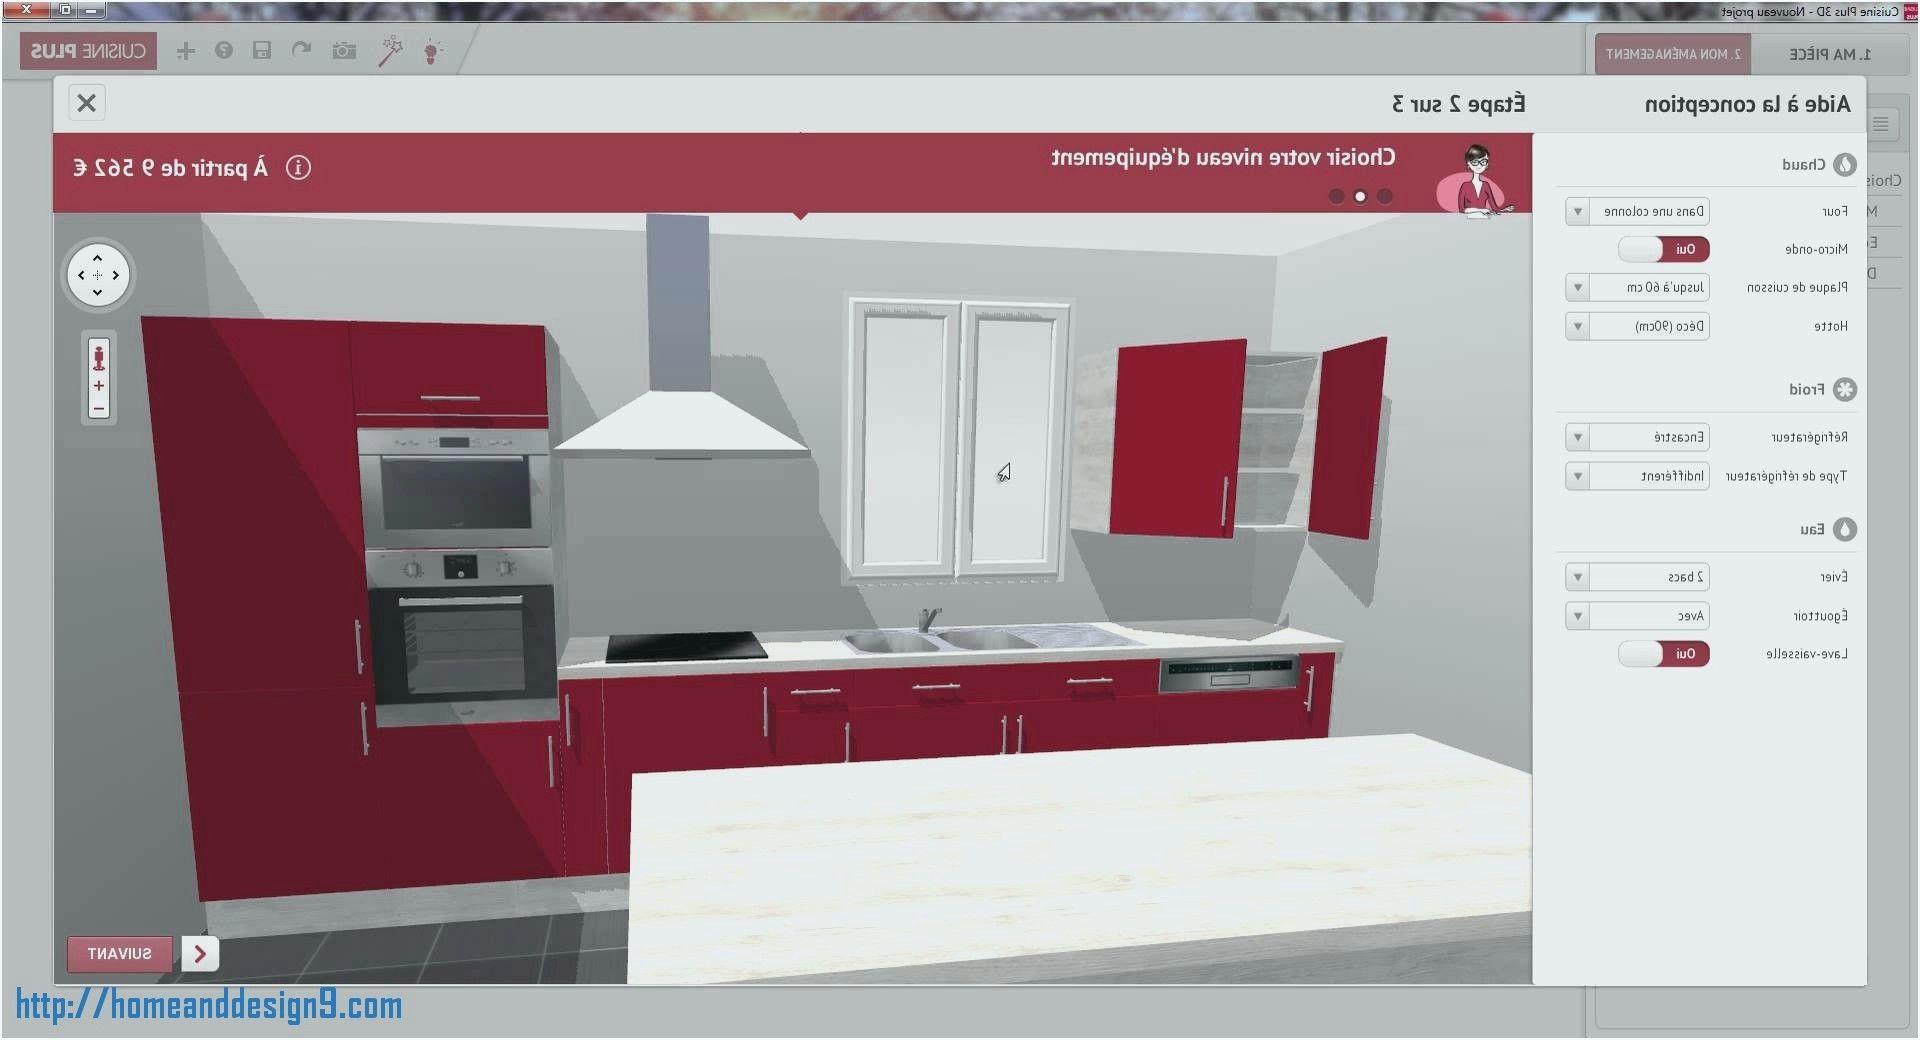 Awesome Logiciel Plan Cuisine 3d Kitchen Plans Design Locker Storage